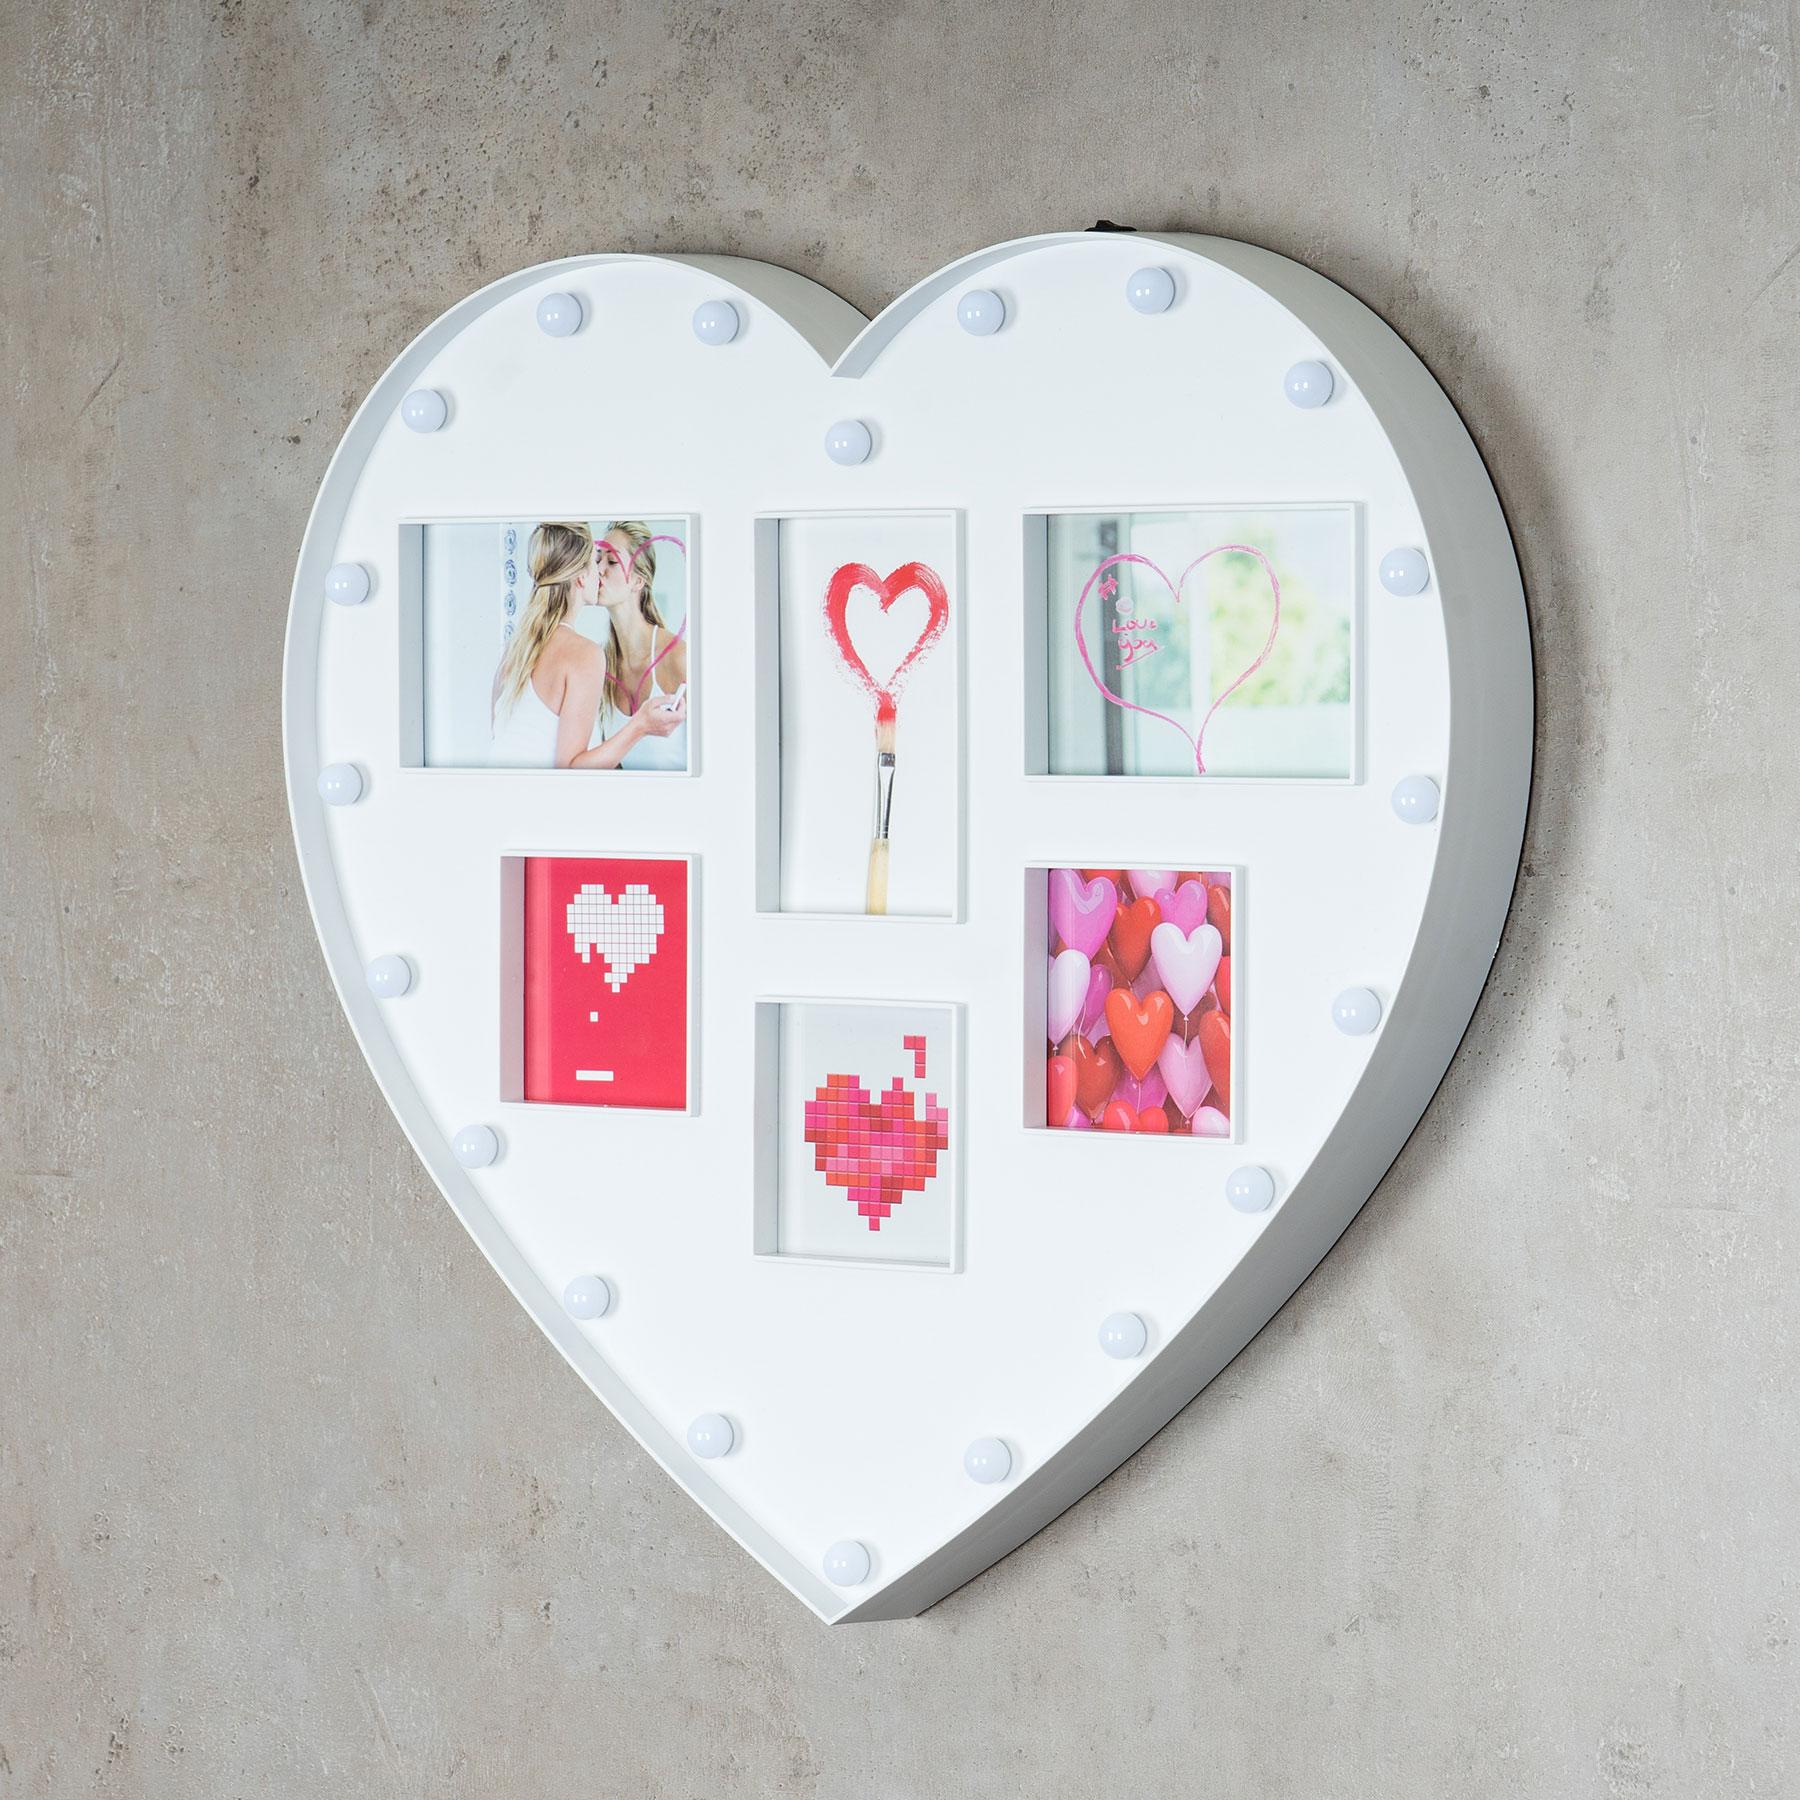 Berühmt Herz Bilderrahmen Vorlage Fotos - Rahmen Ideen ...